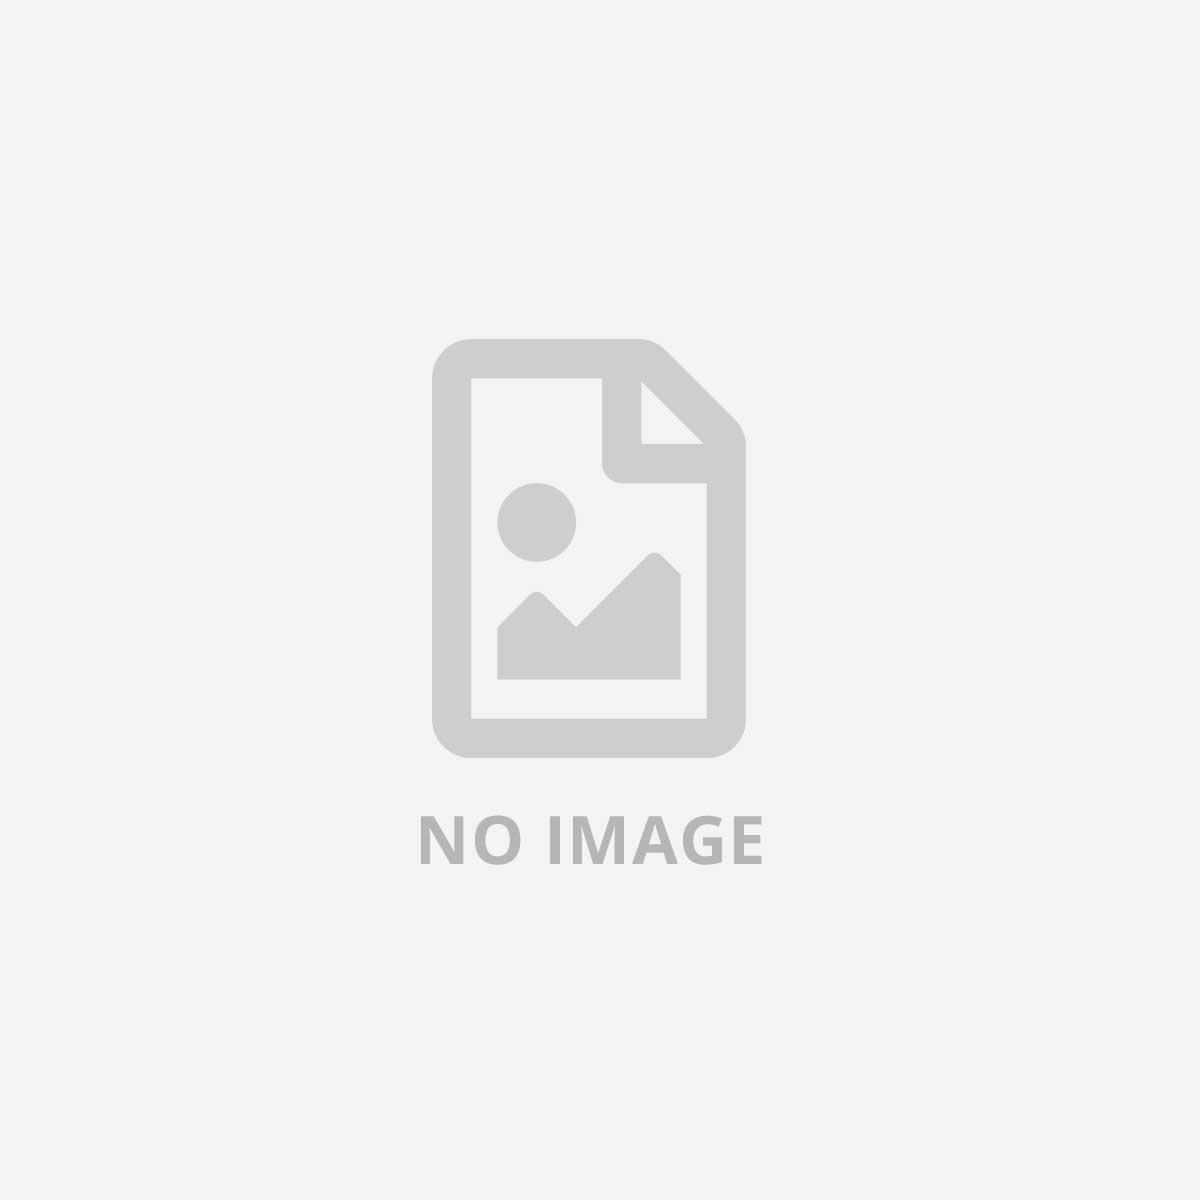 KINGSTON 16GB MICROSDHC CANVAS SELECT 80R